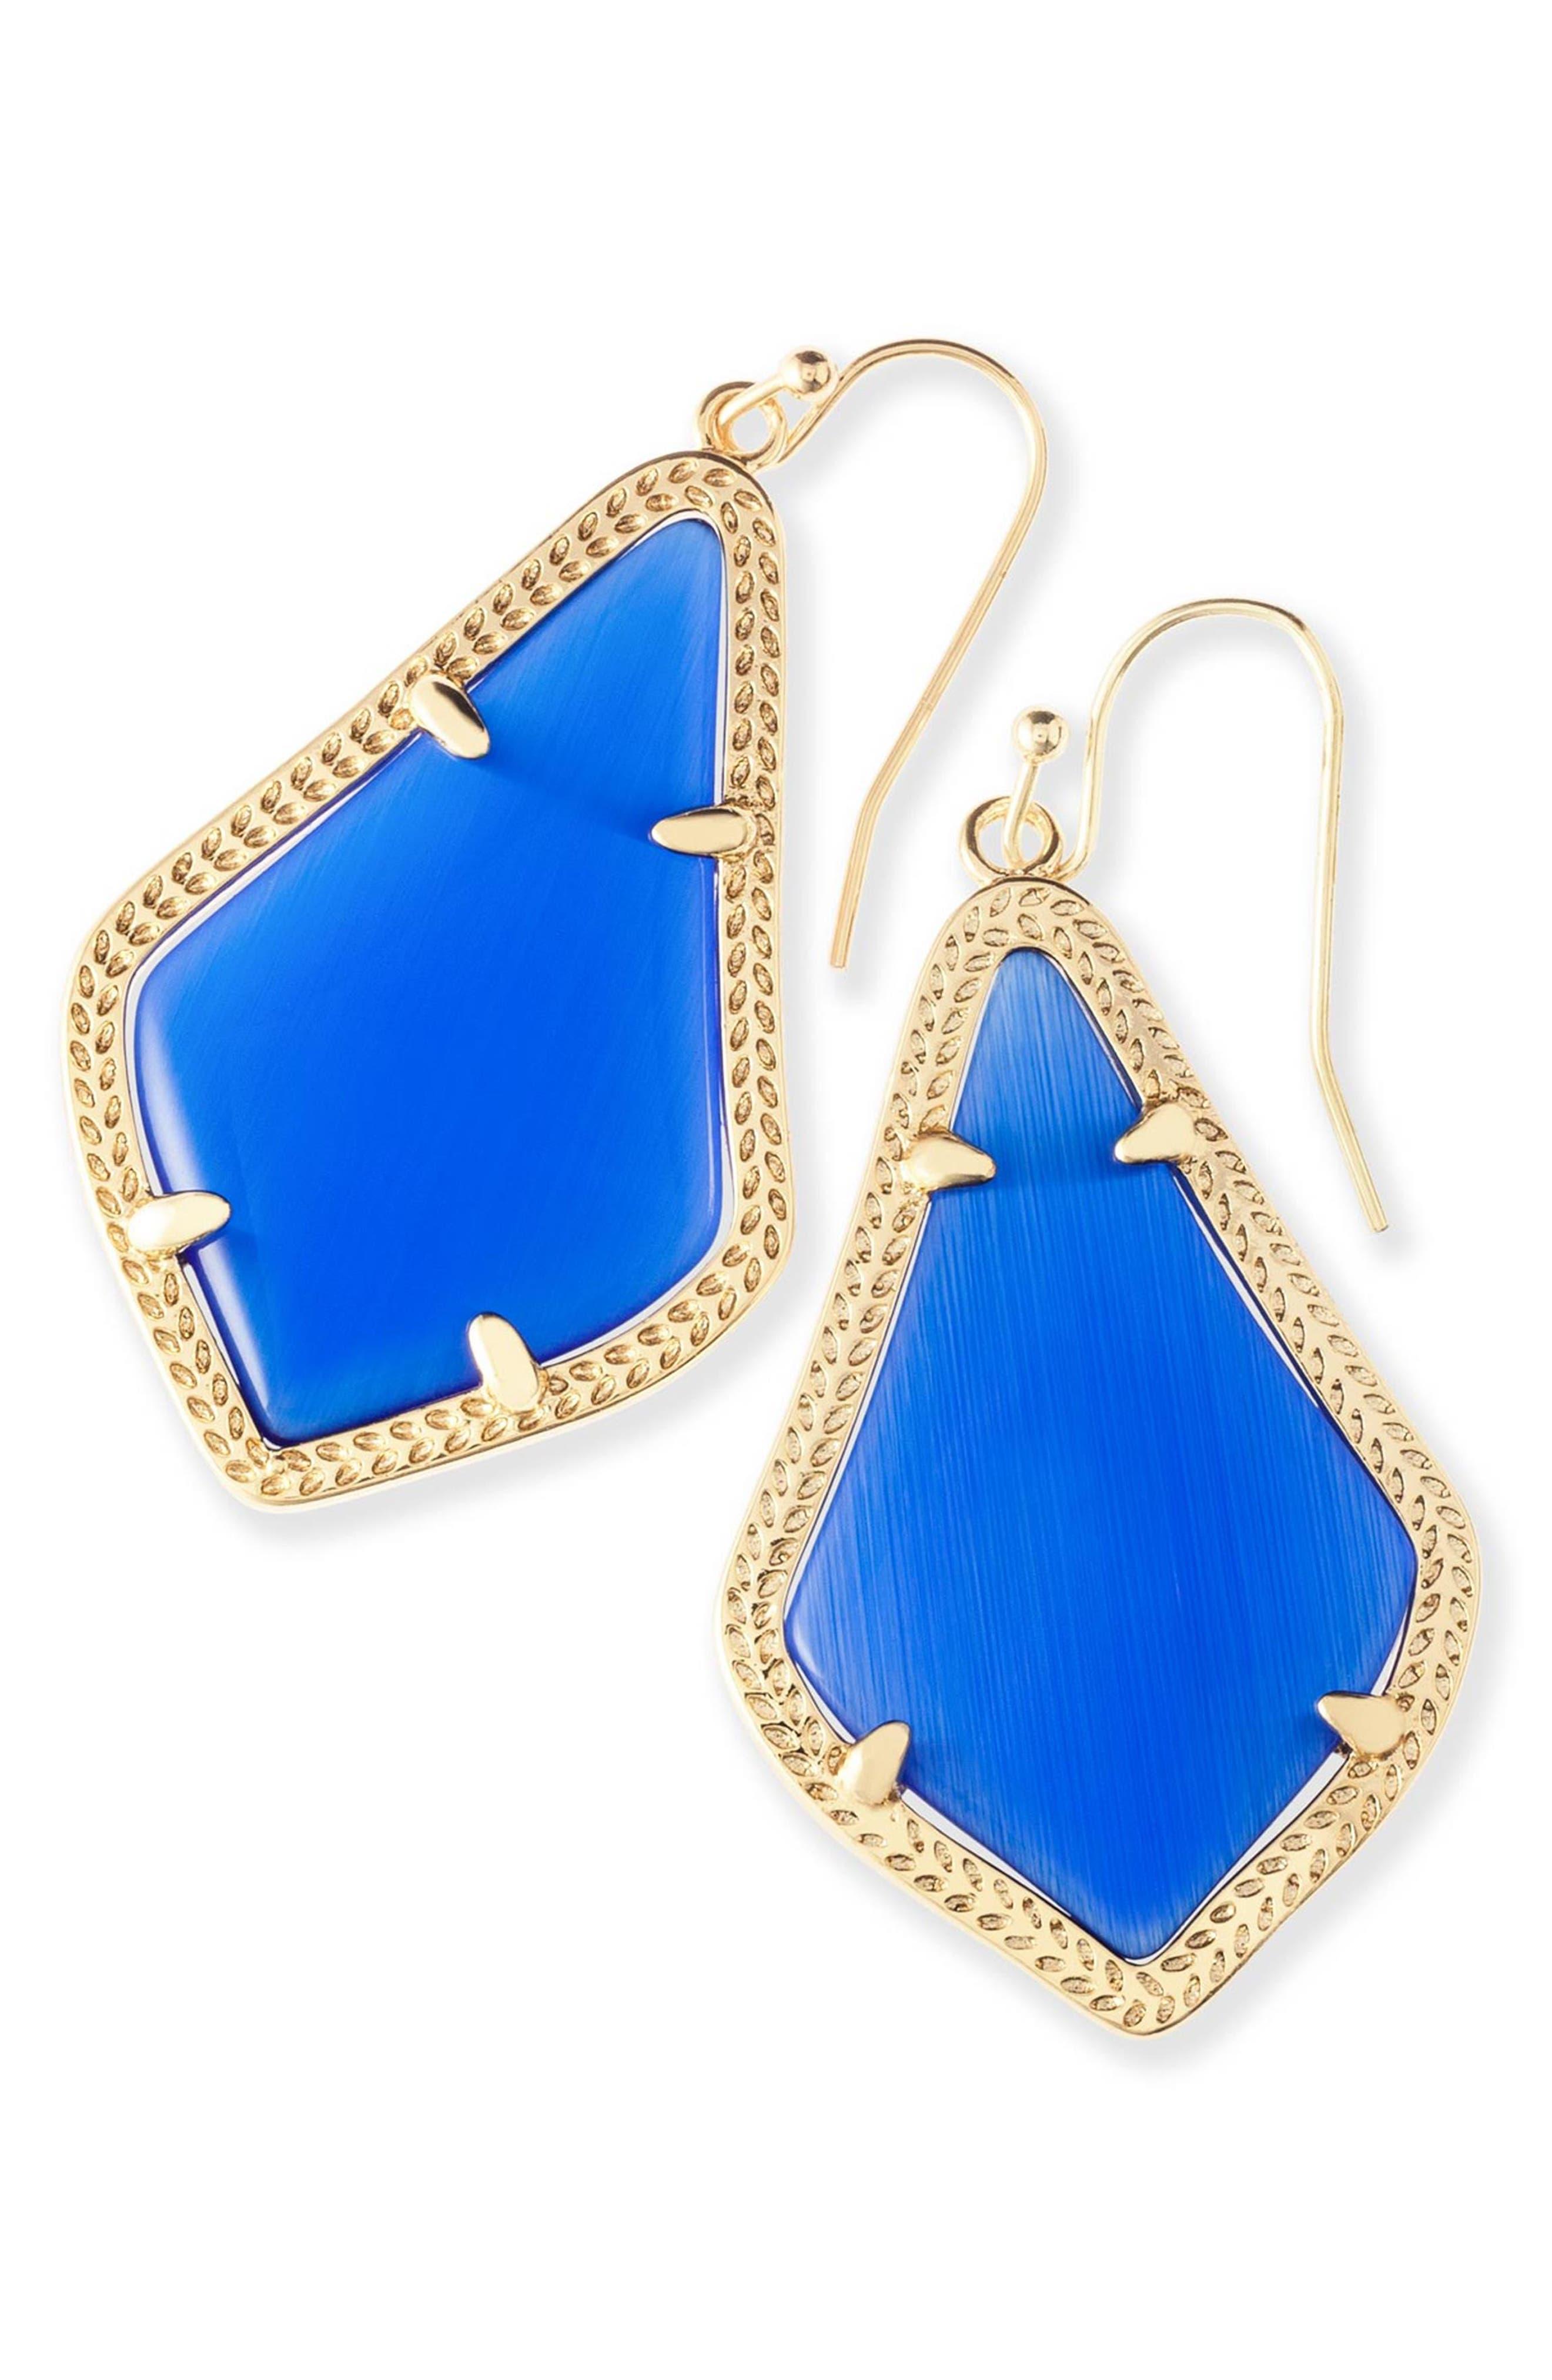 Alex Drop Earrings,                         Main,                         color, Cobalt Catseye/ Gold